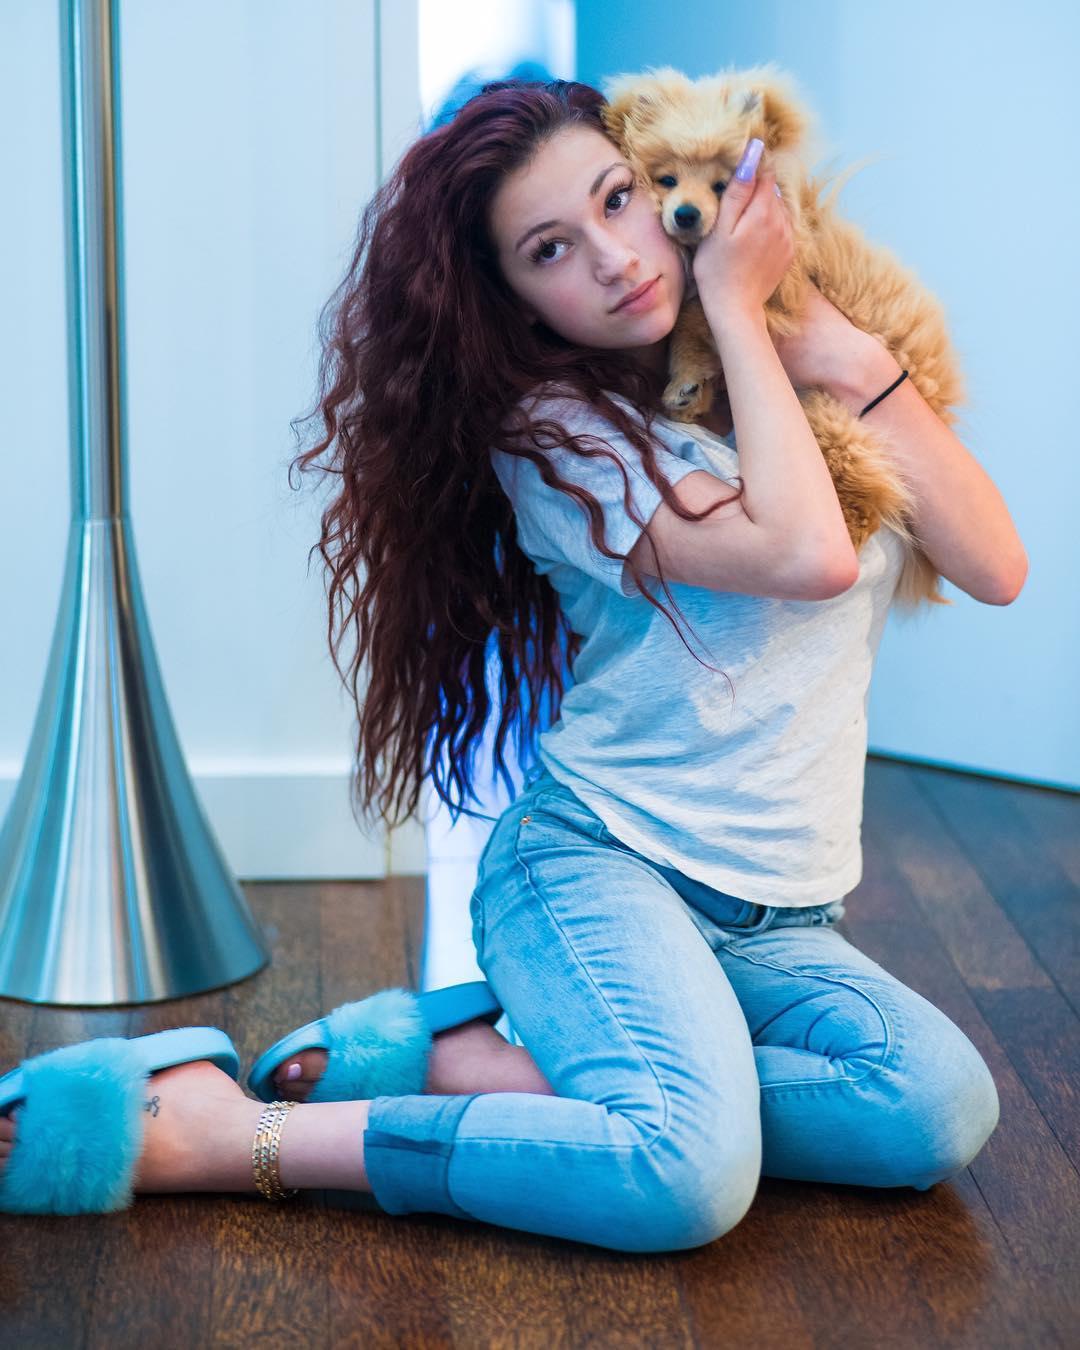 Hot Photos Of Danielle Bregoli | Nude Bhad Bhabie - Barnorama